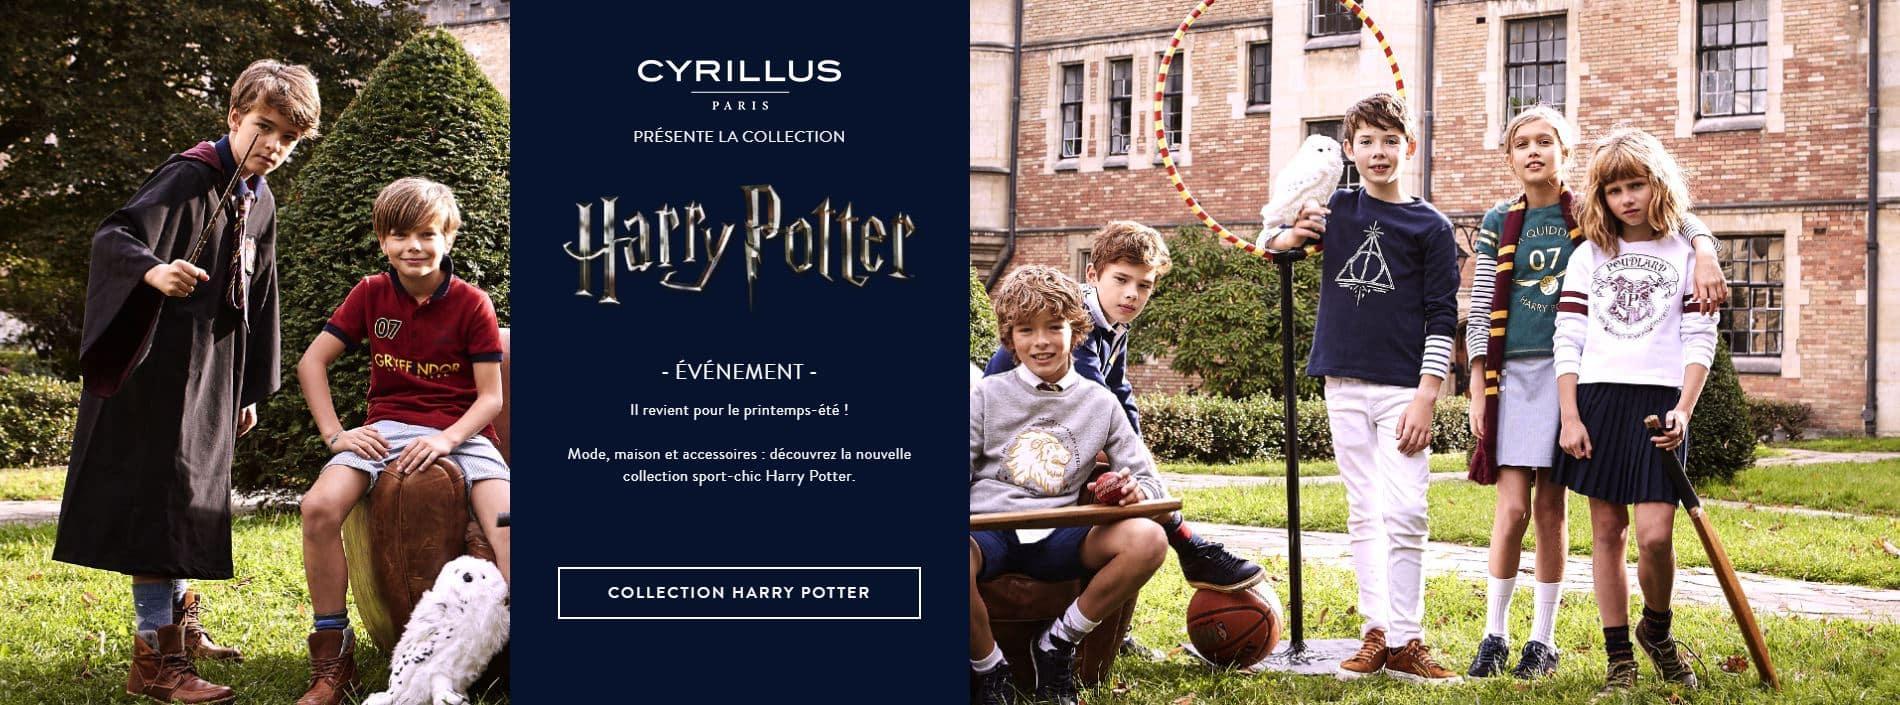 Cyrillus lance une collection Harry Potter 2